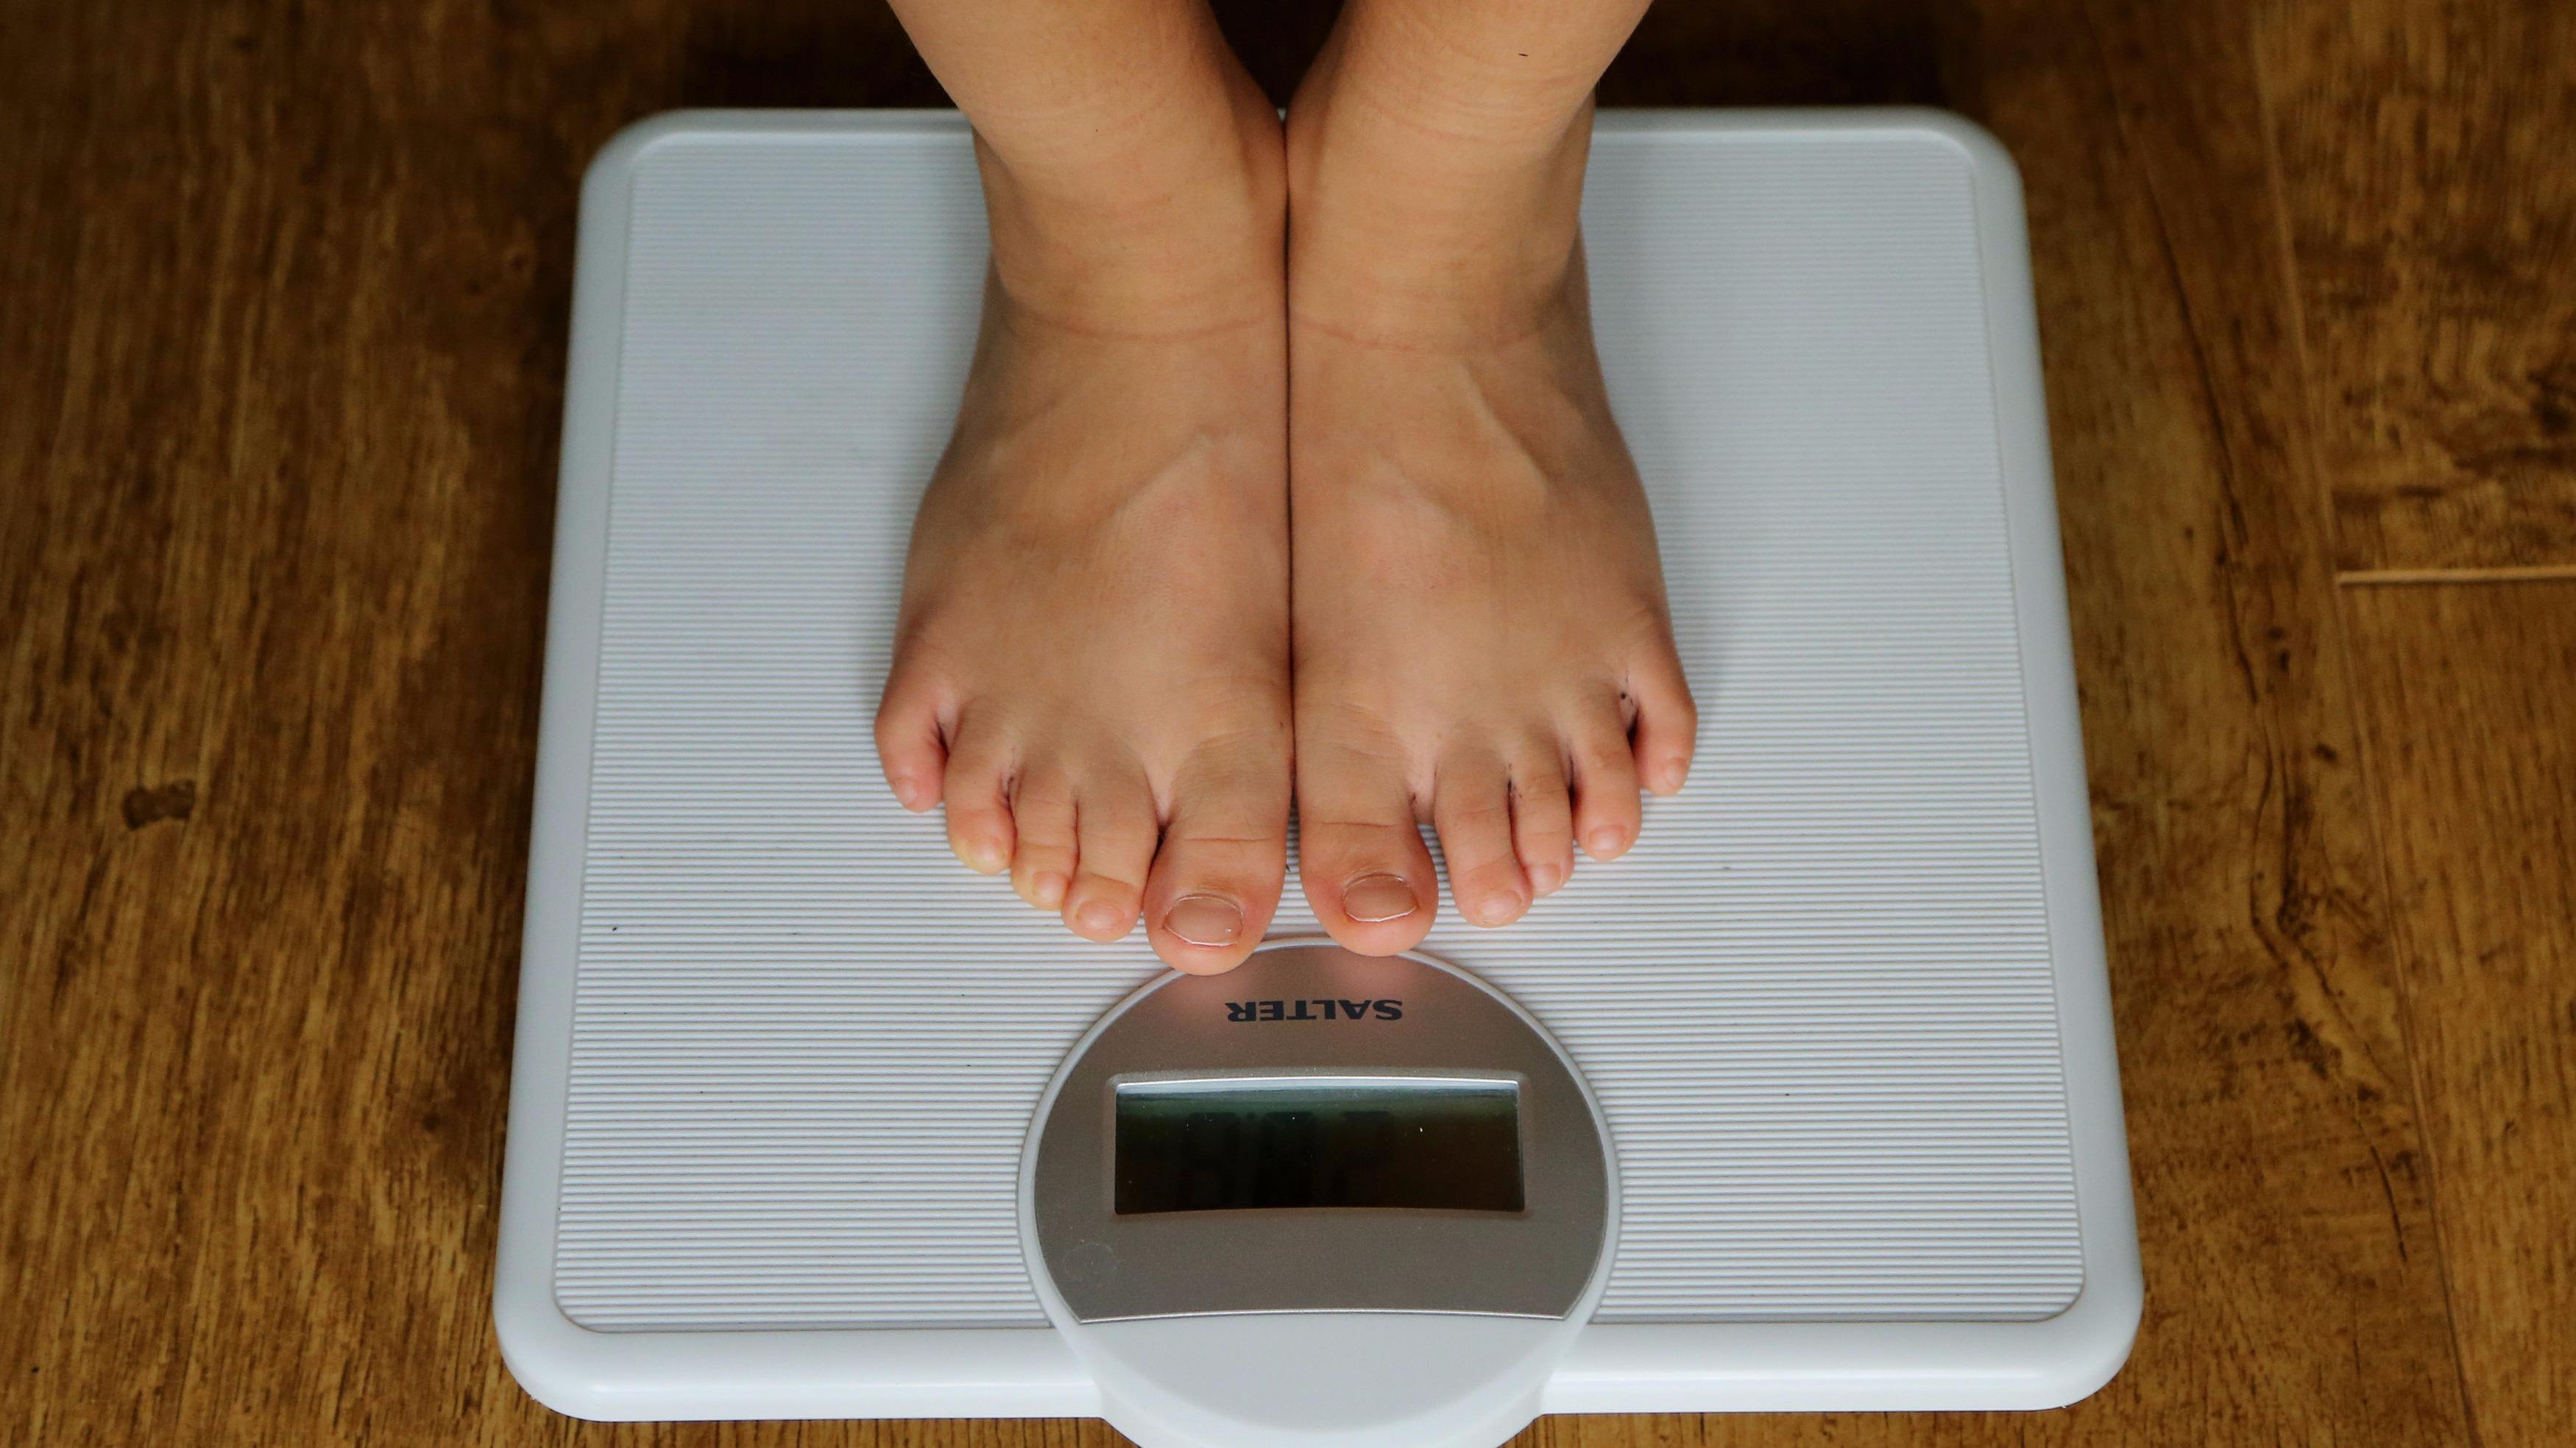 noveske nsr handgards weight loss